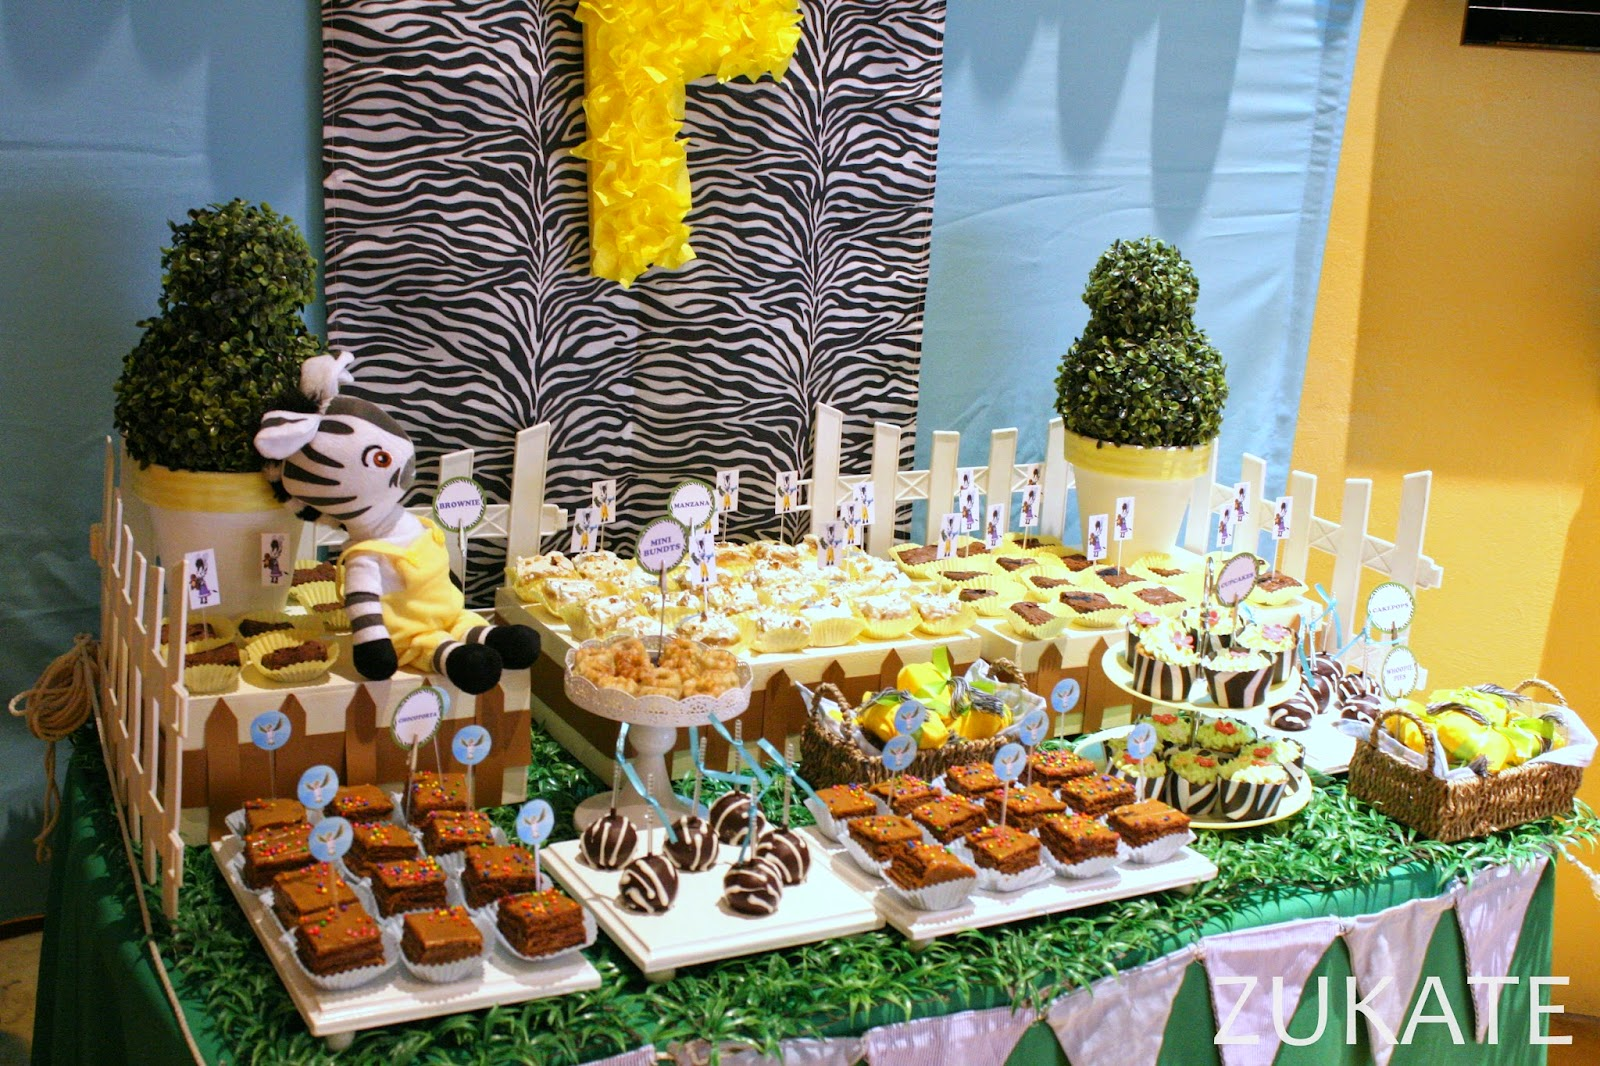 Mesa dulce de la cebra zou para fede zukate for Decoracion cebra